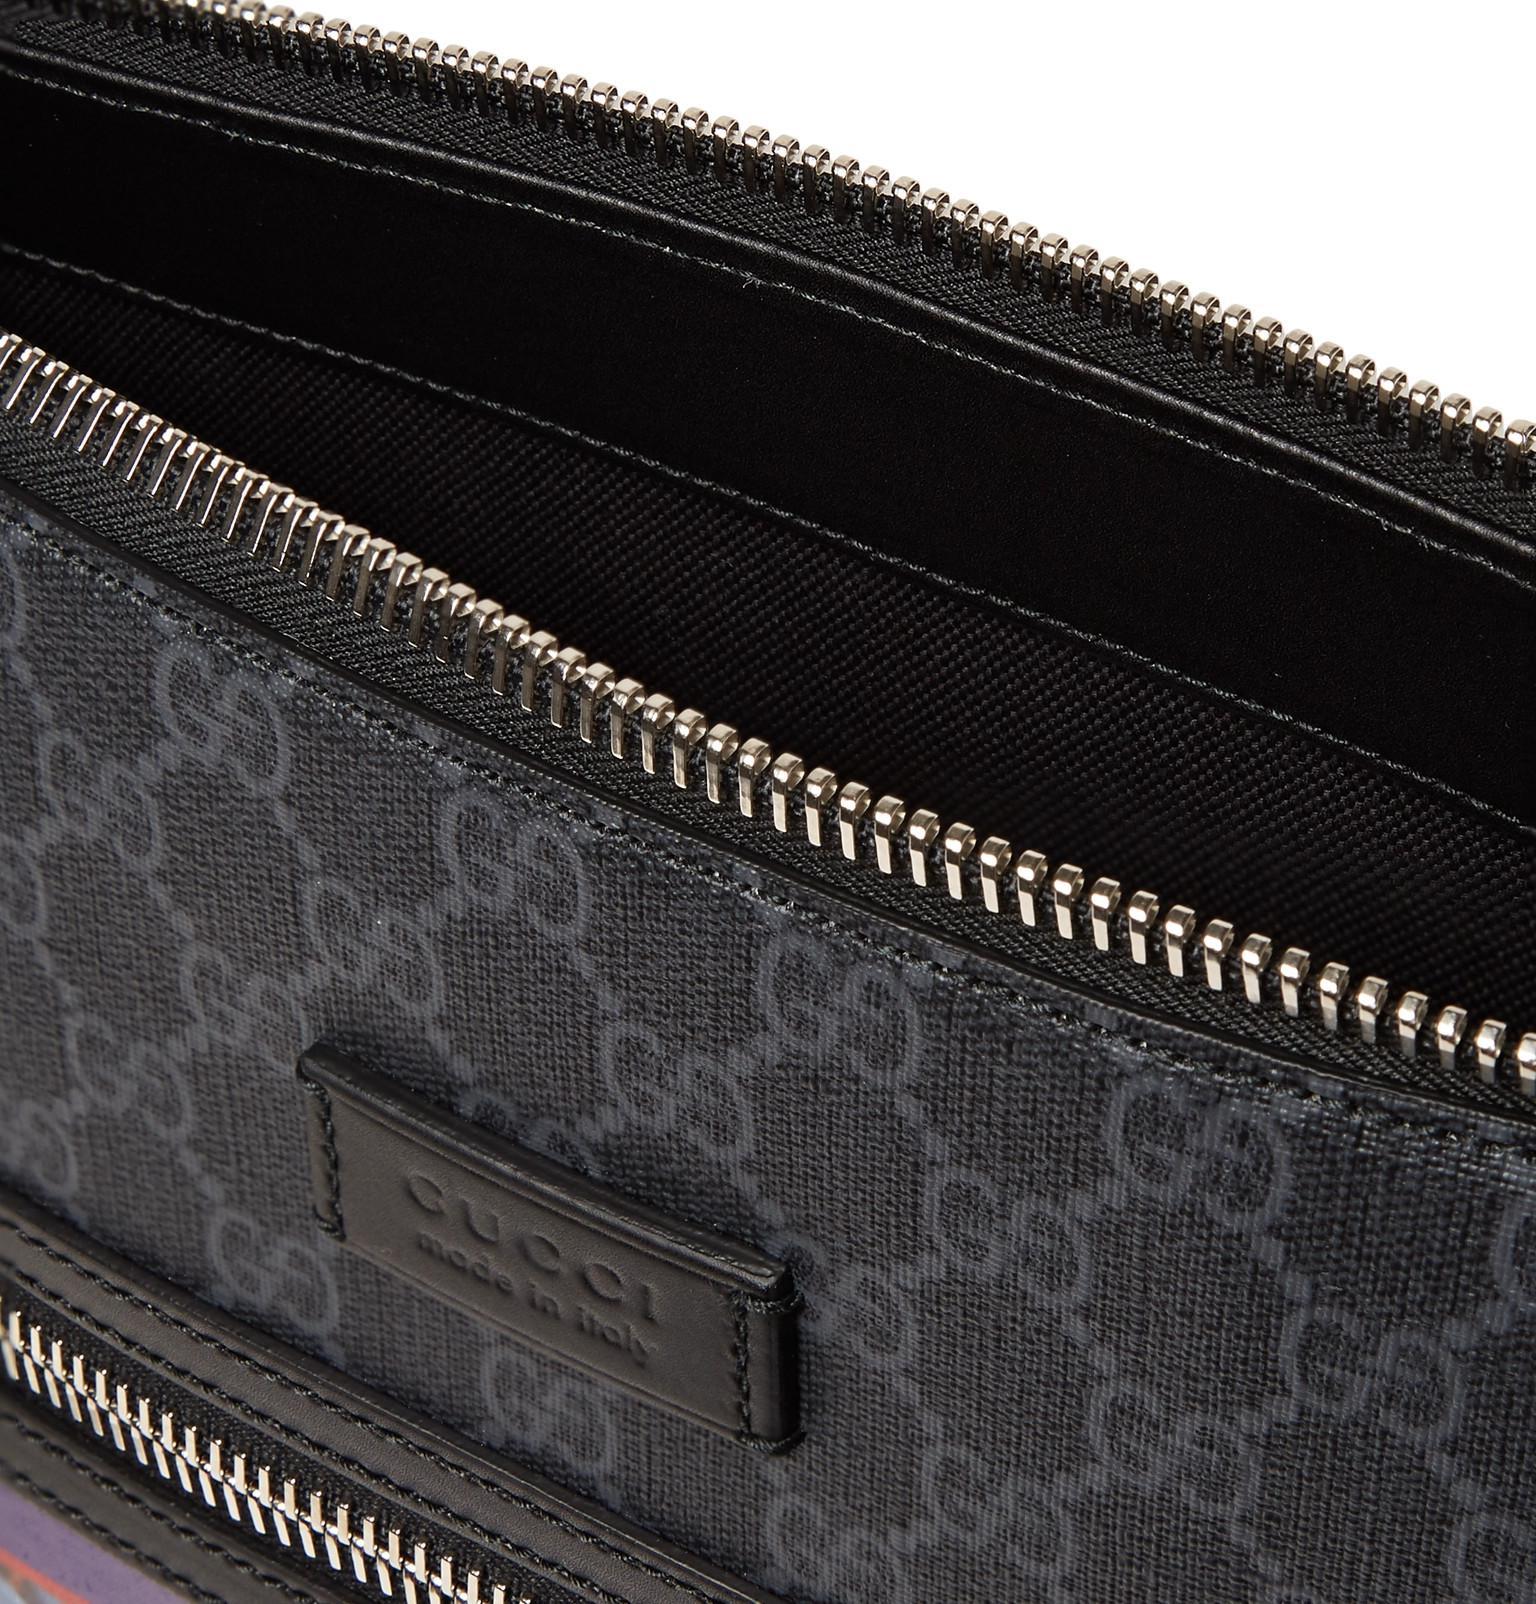 ced998688ca1 Gucci - Black Leather-trimmed Appliquéd Monogrammed Coated-canvas Messenger  Bag for Men -. View fullscreen